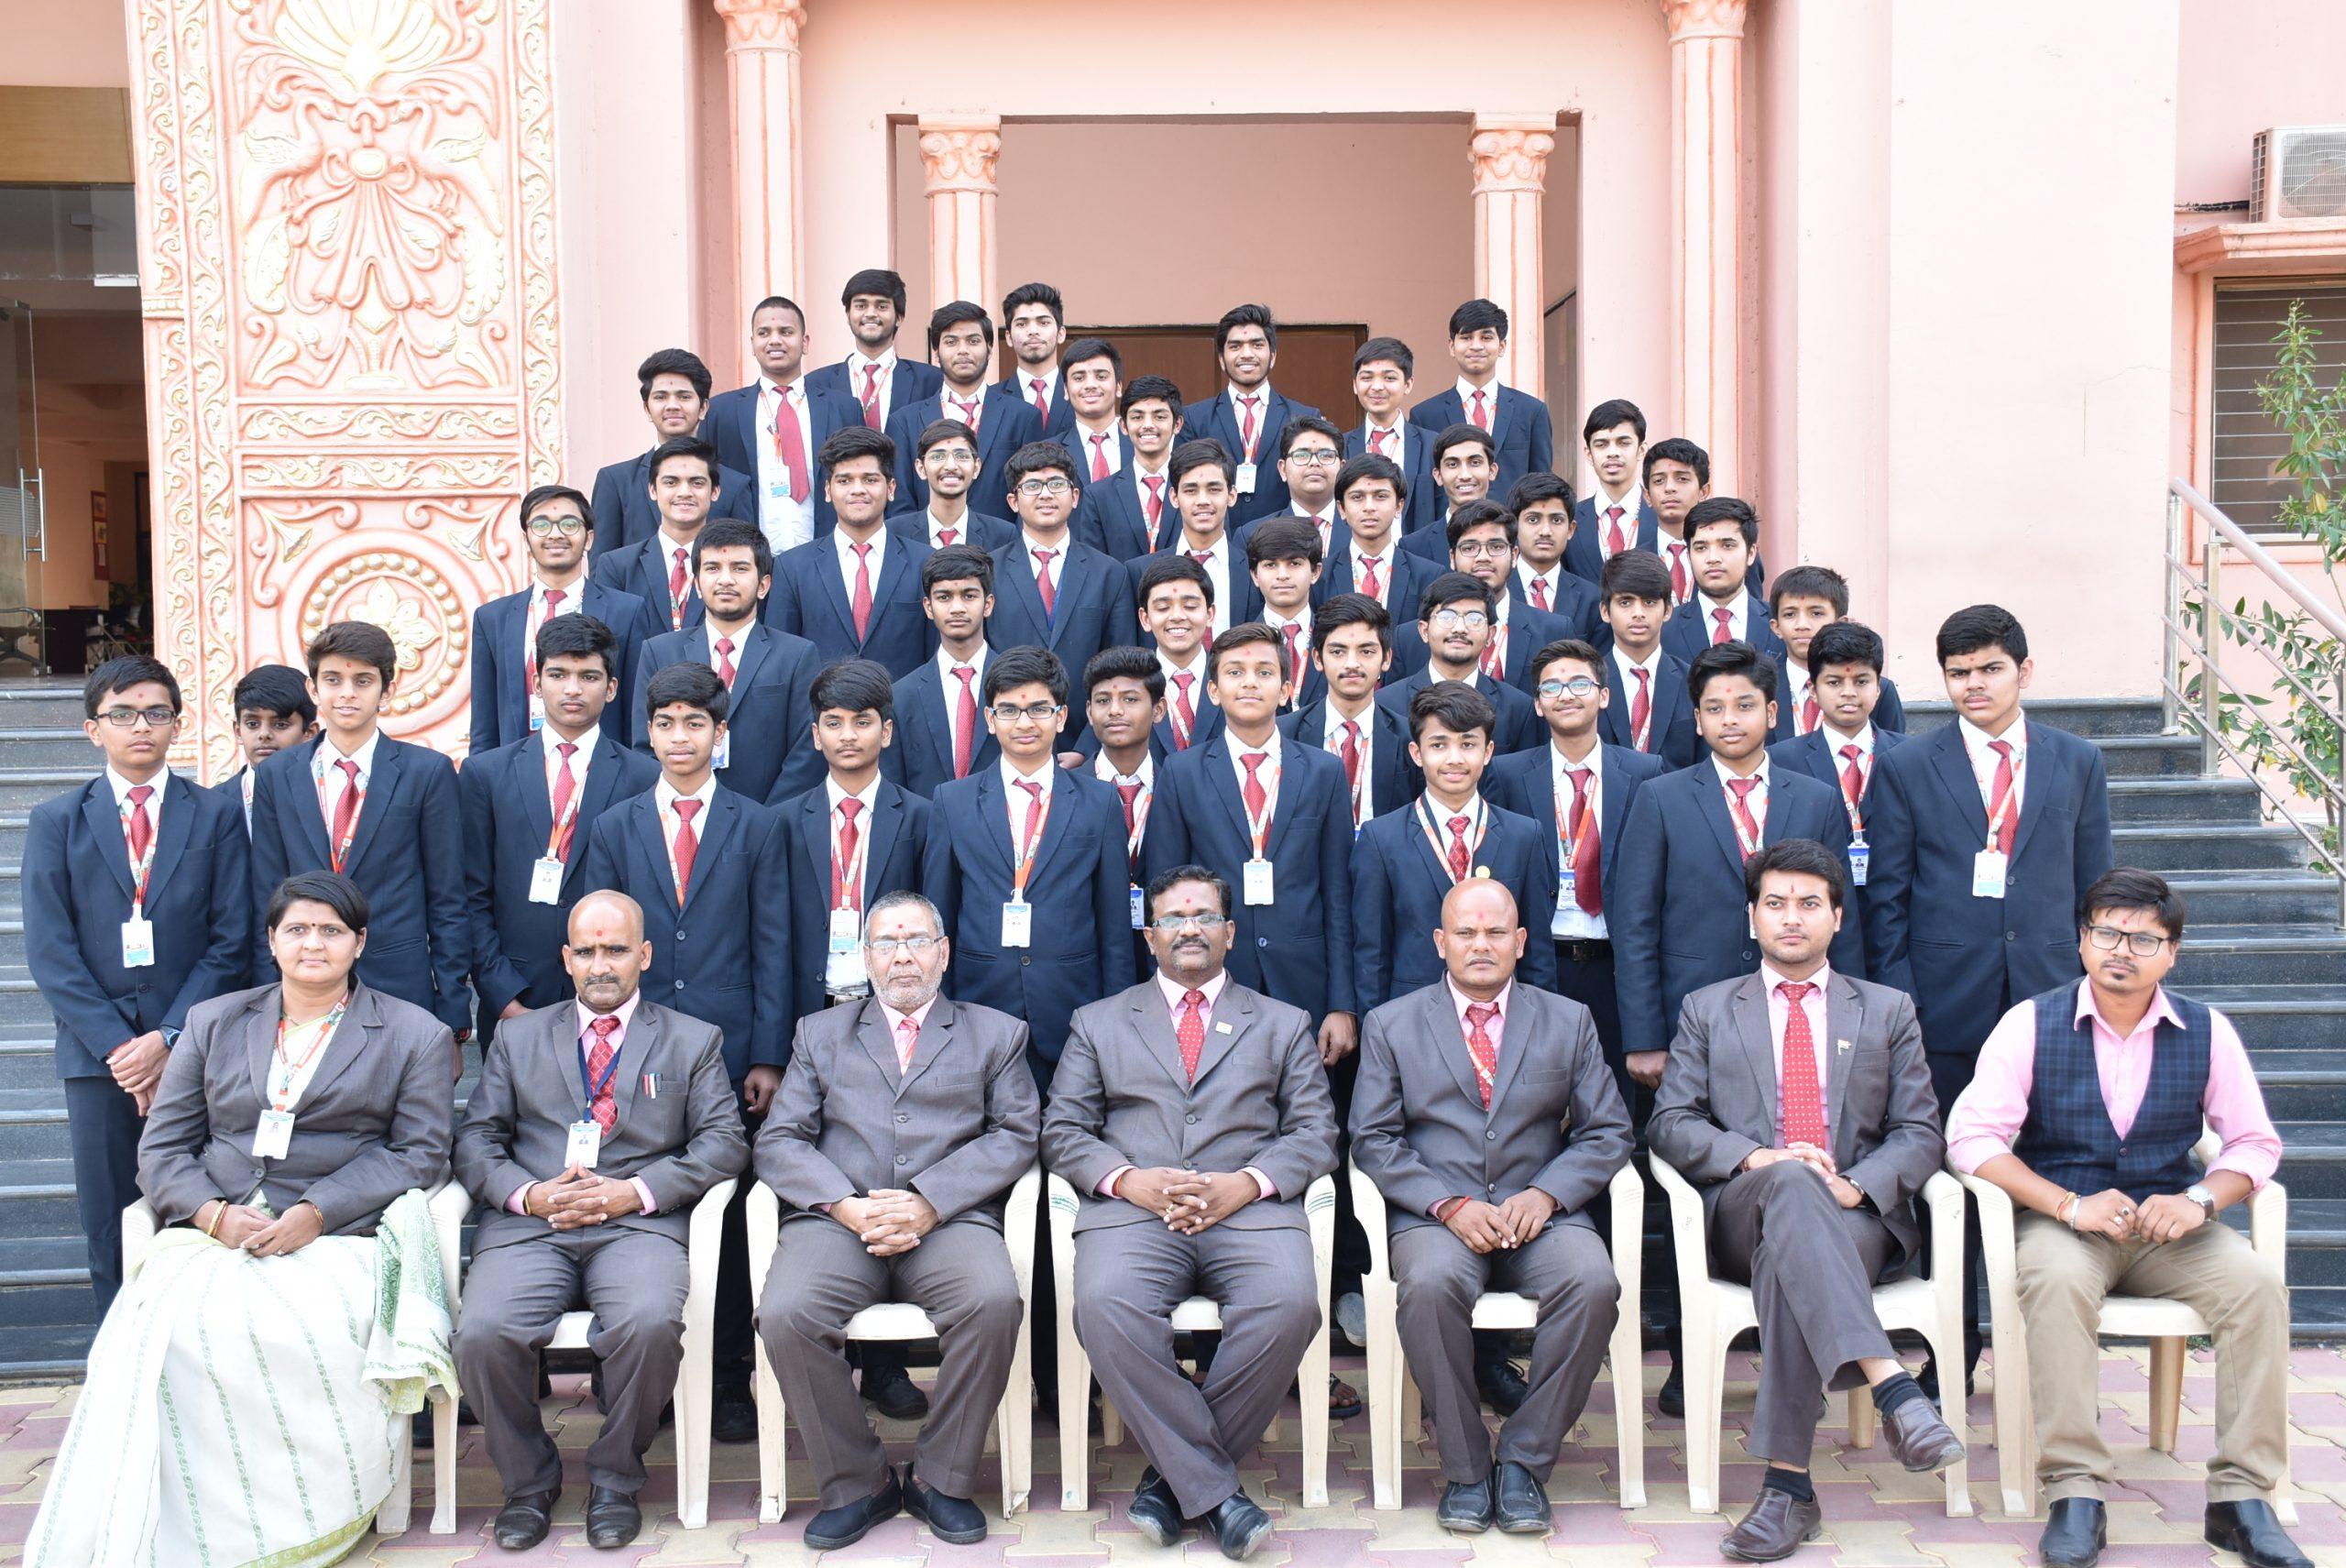 SHREE NEELAKANTH VIDYAPEETH Students and Teachers Group Photo